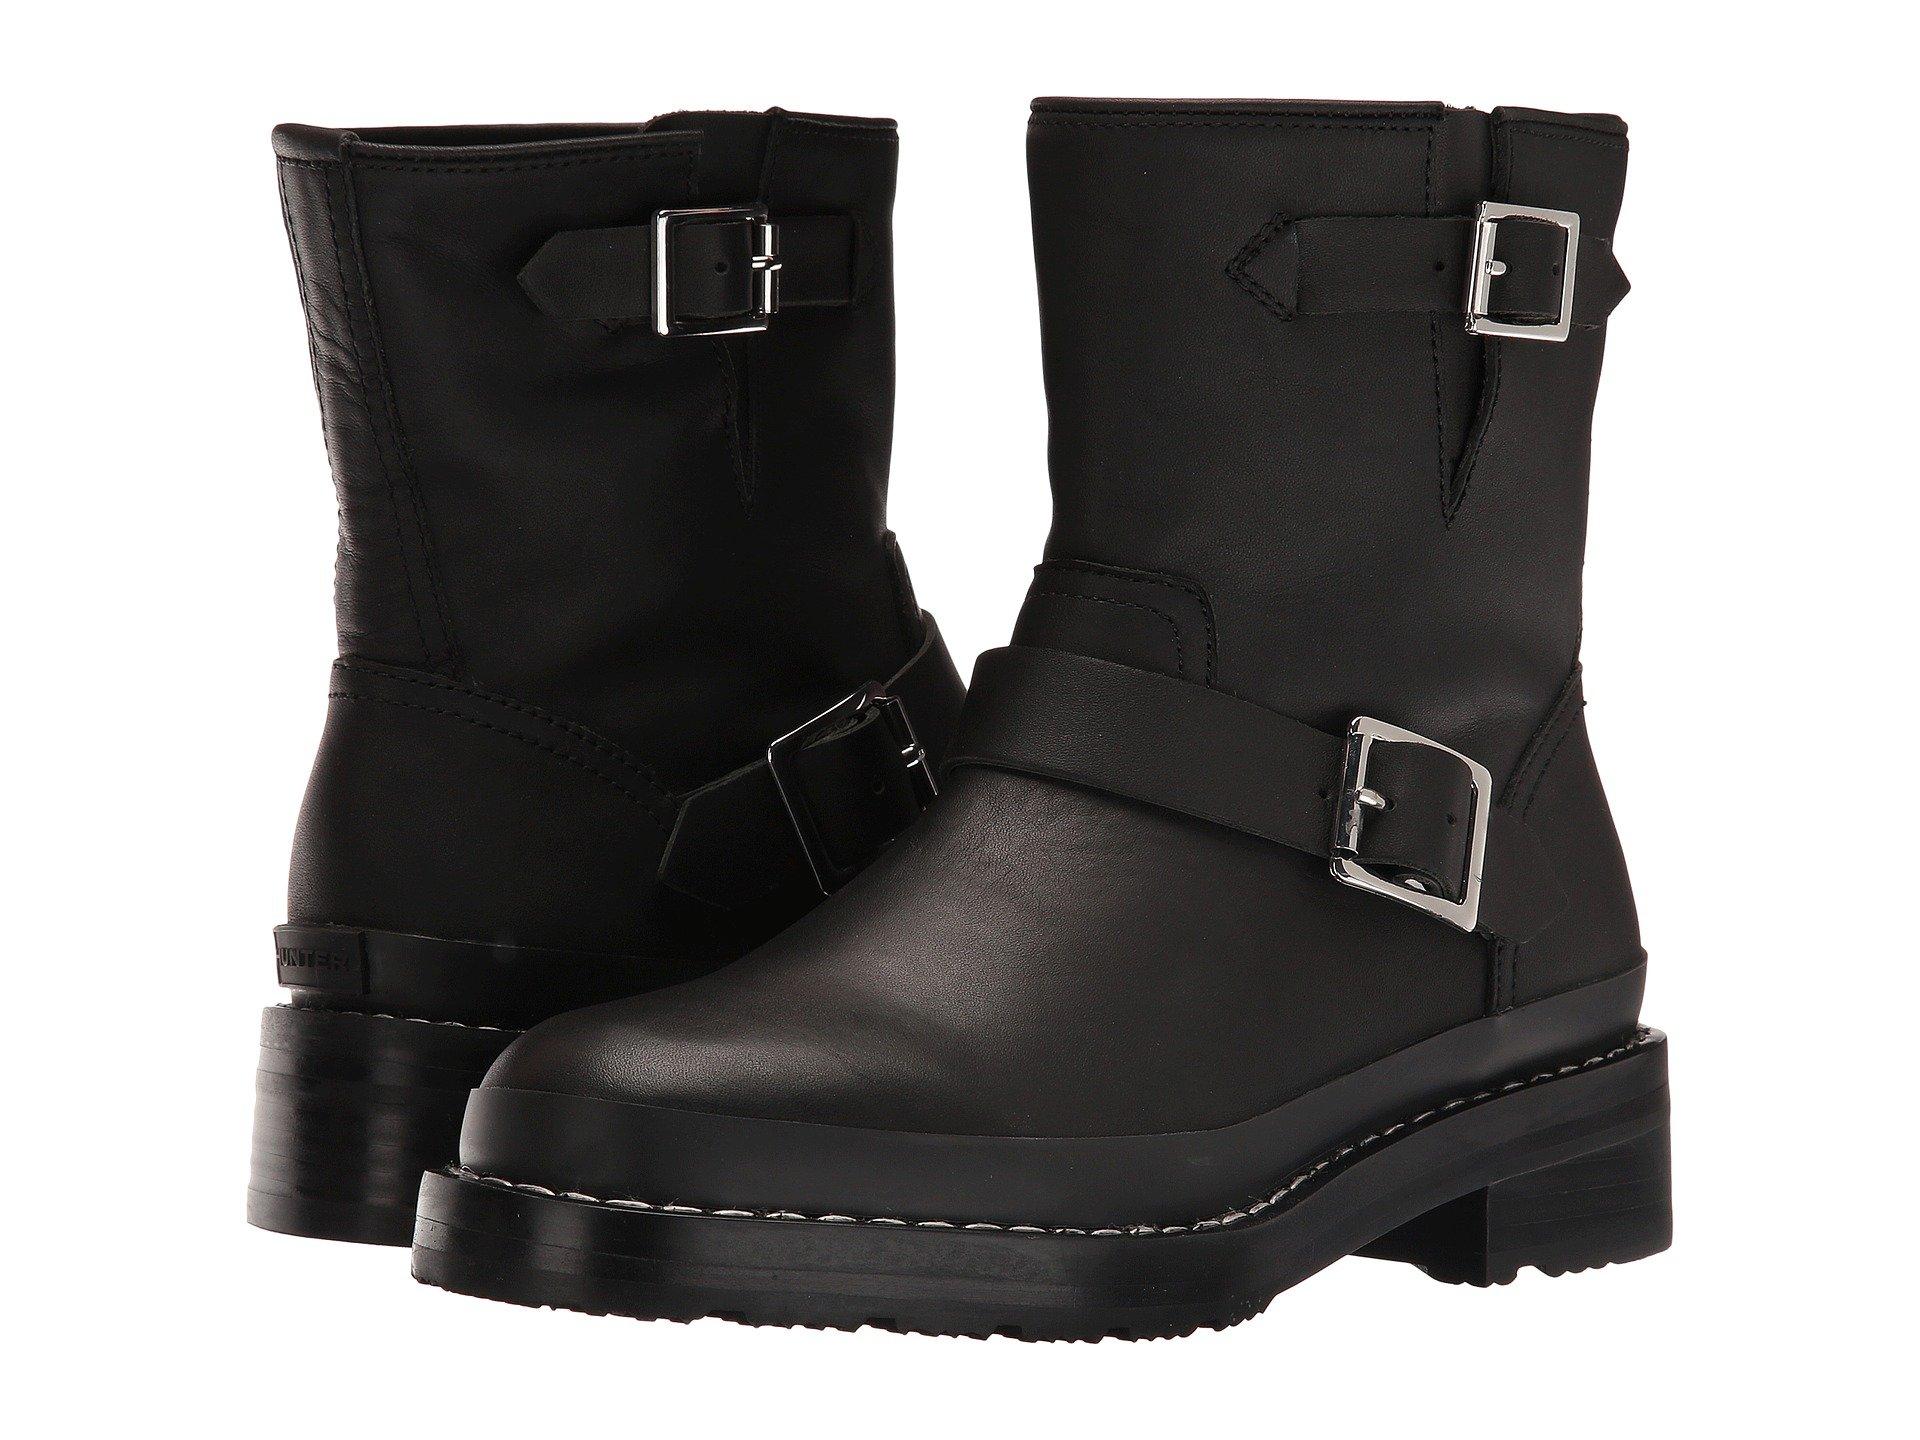 Original Leather Biker Boot